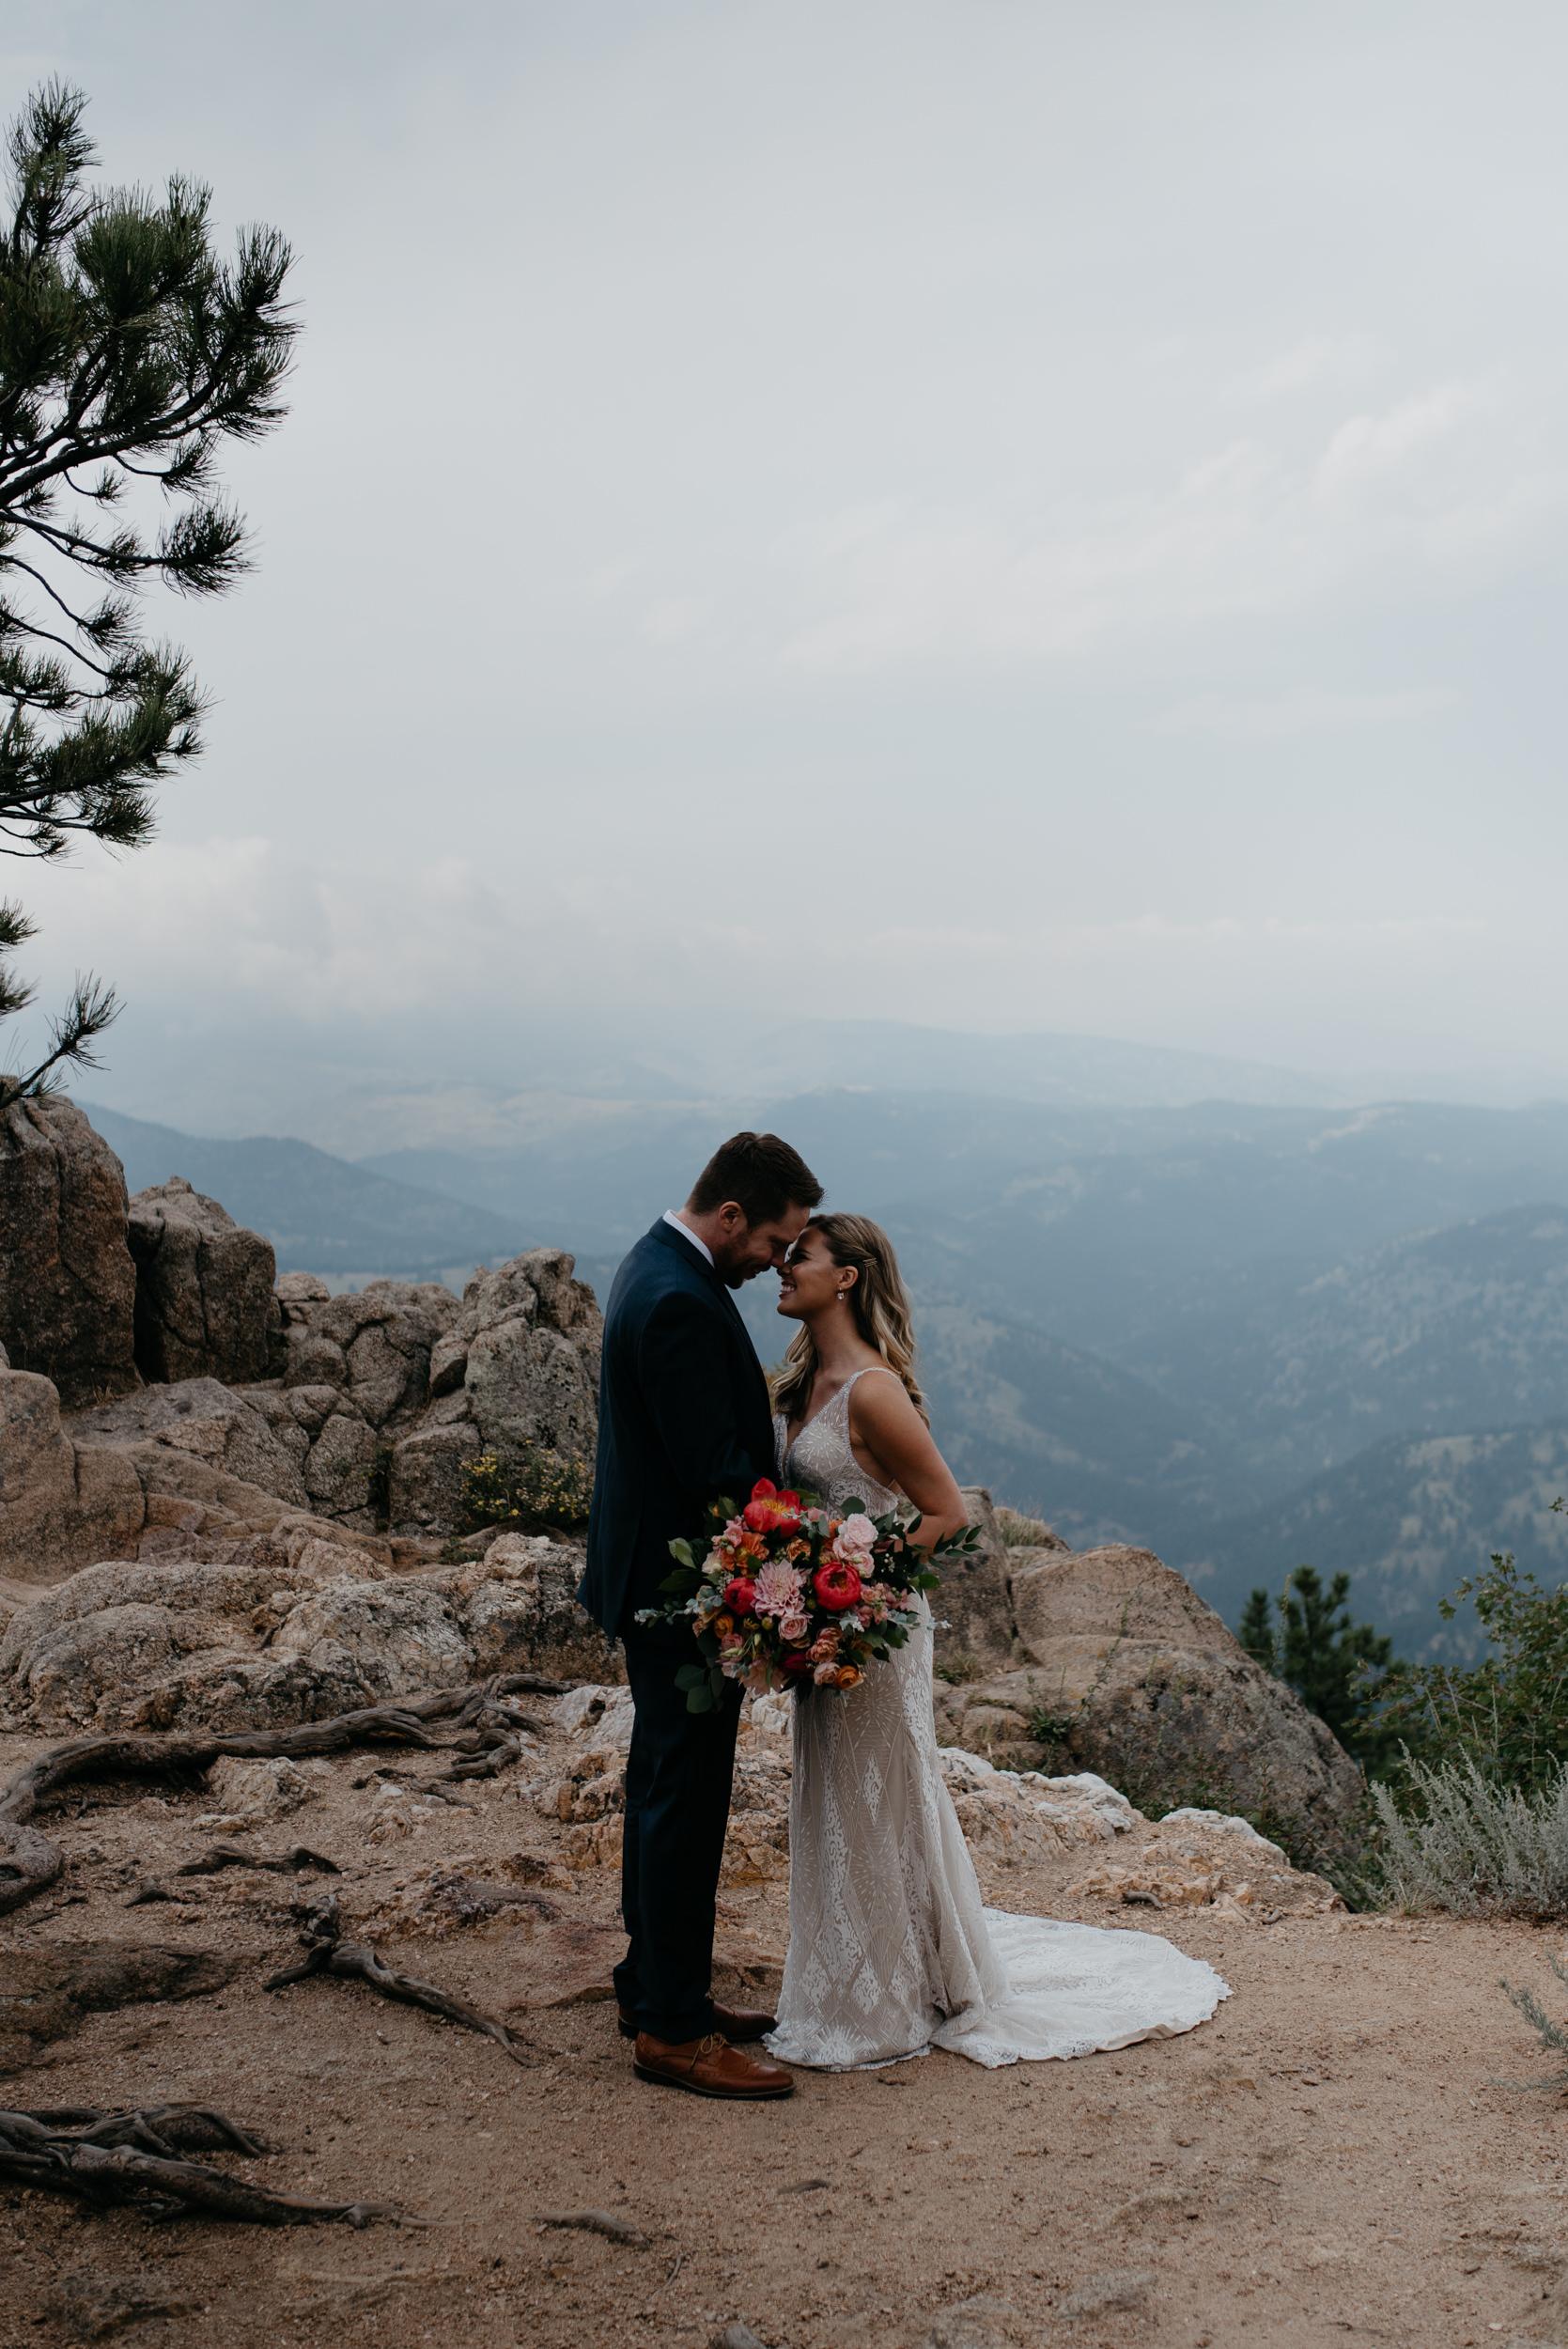 Boulder, Colorado mountain elopement at Lost Gulch. Colorado adventure elopement and wedding photographer.